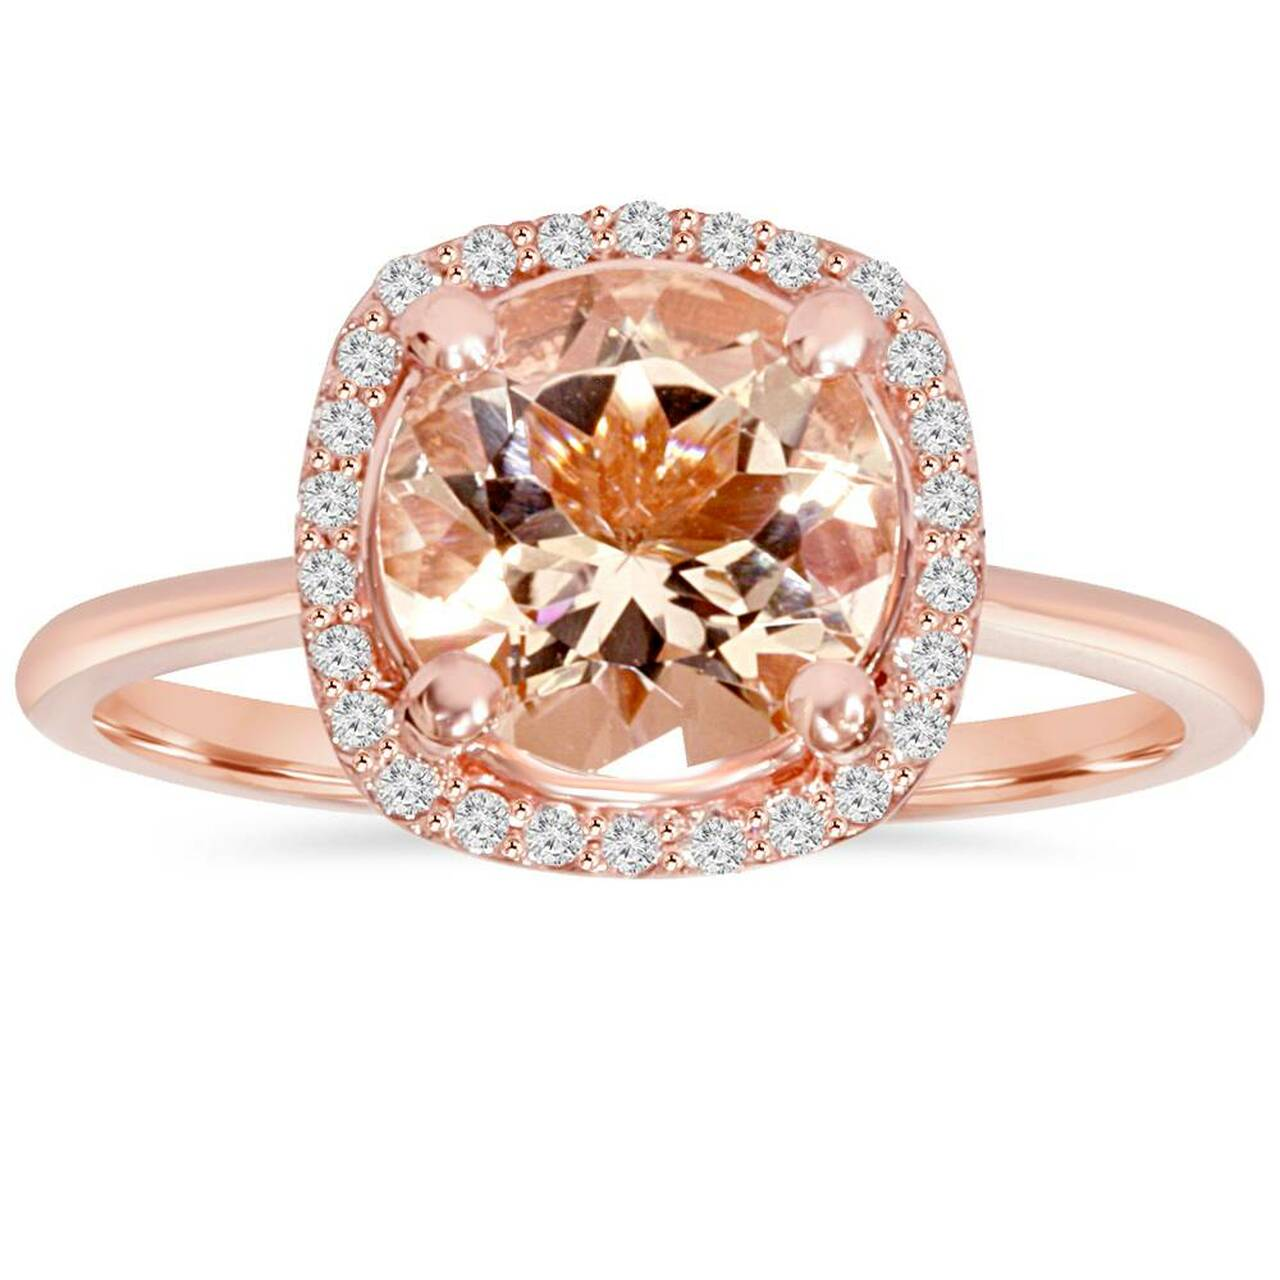 7ab5763acf946 1 3 4 CT Morganite   Diamond Cushion Halo 14K Rose Gold Ring